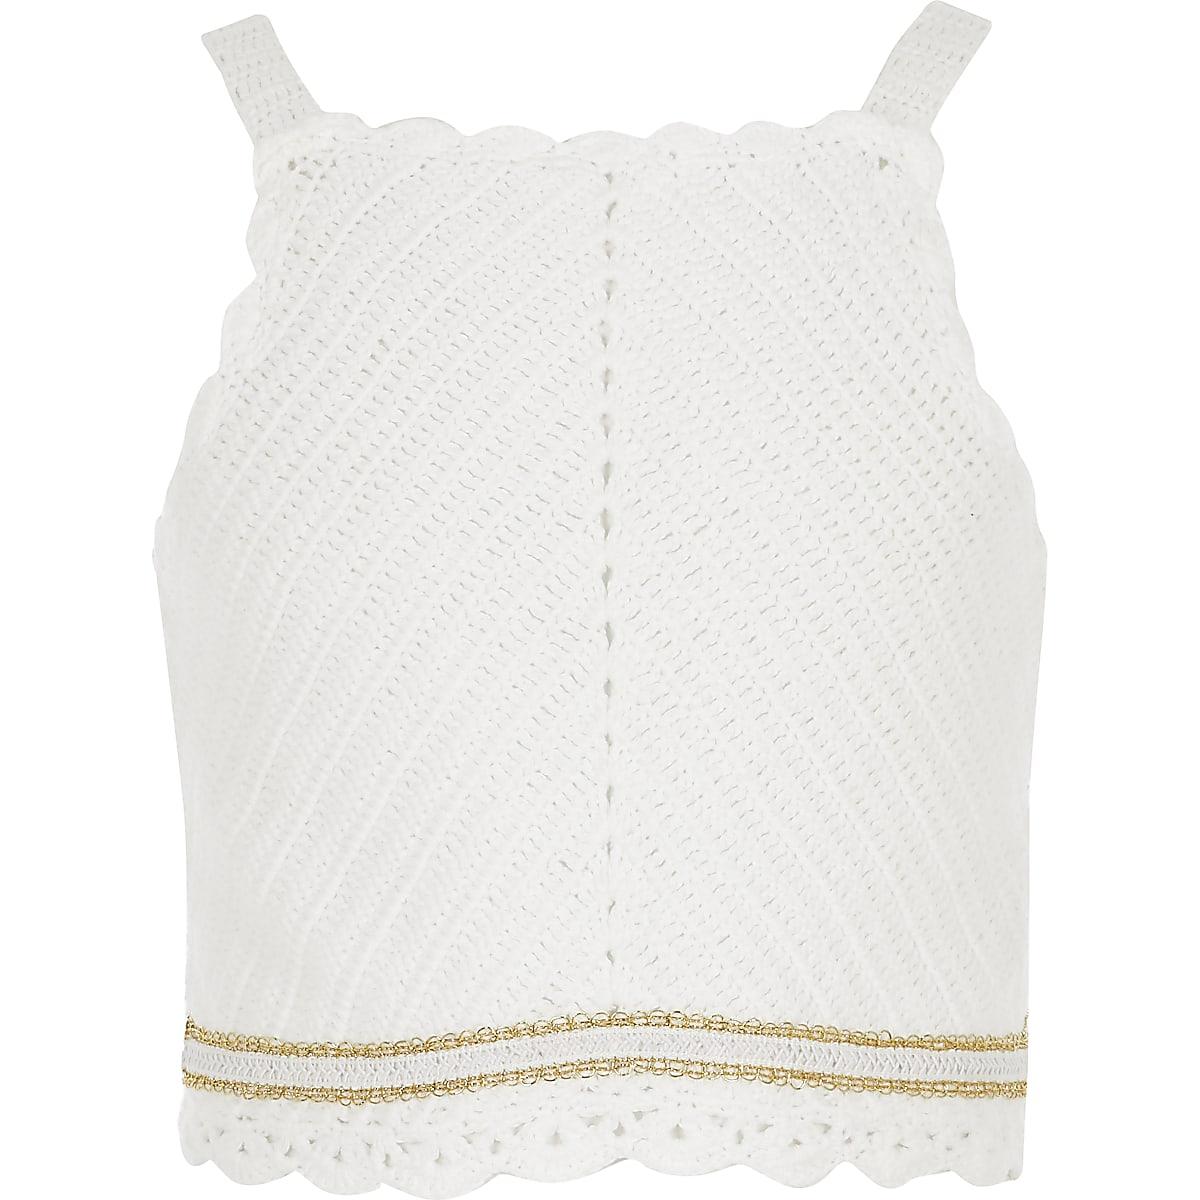 Girls White Crochet Top Cardigans Jumpers Tops Girls